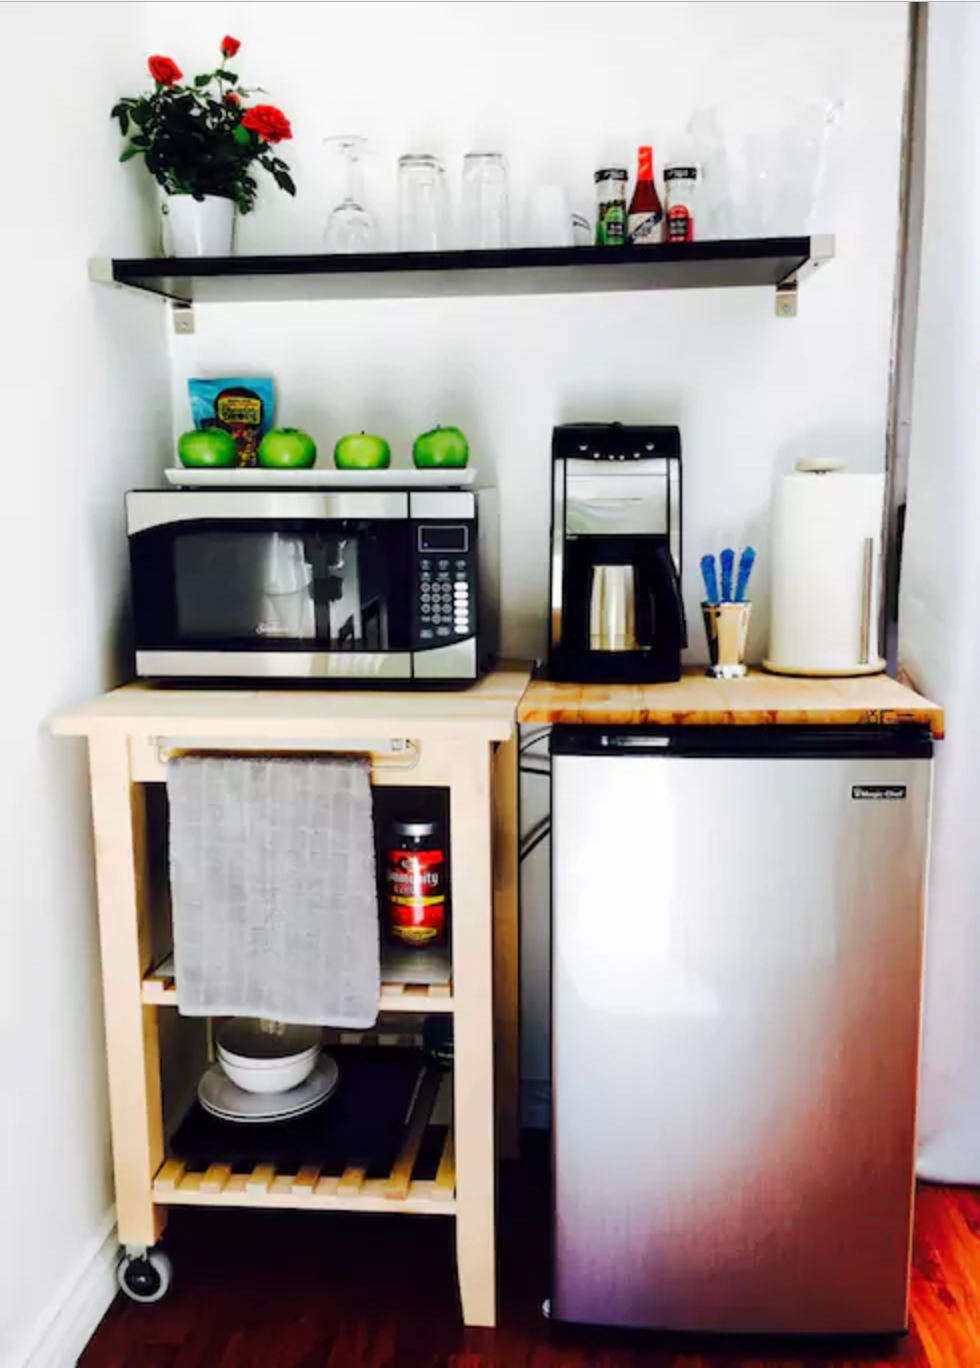 Kitchenette With All The Essentials And Treats Dorm Room Kitchen Kitchenette Design Small Kitchenette